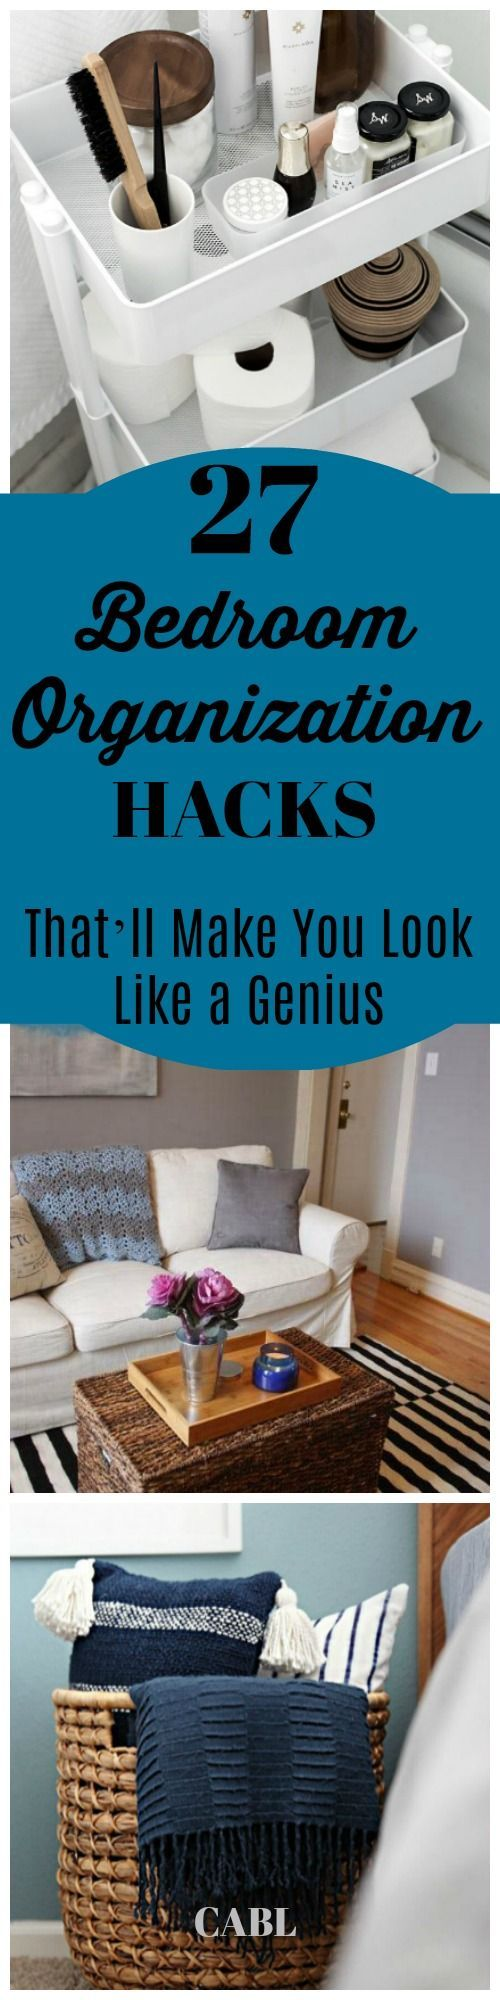 27 Bedroom Organization Hacks That'll Make You Look Like a Genius #ORGANIZATION #hacks